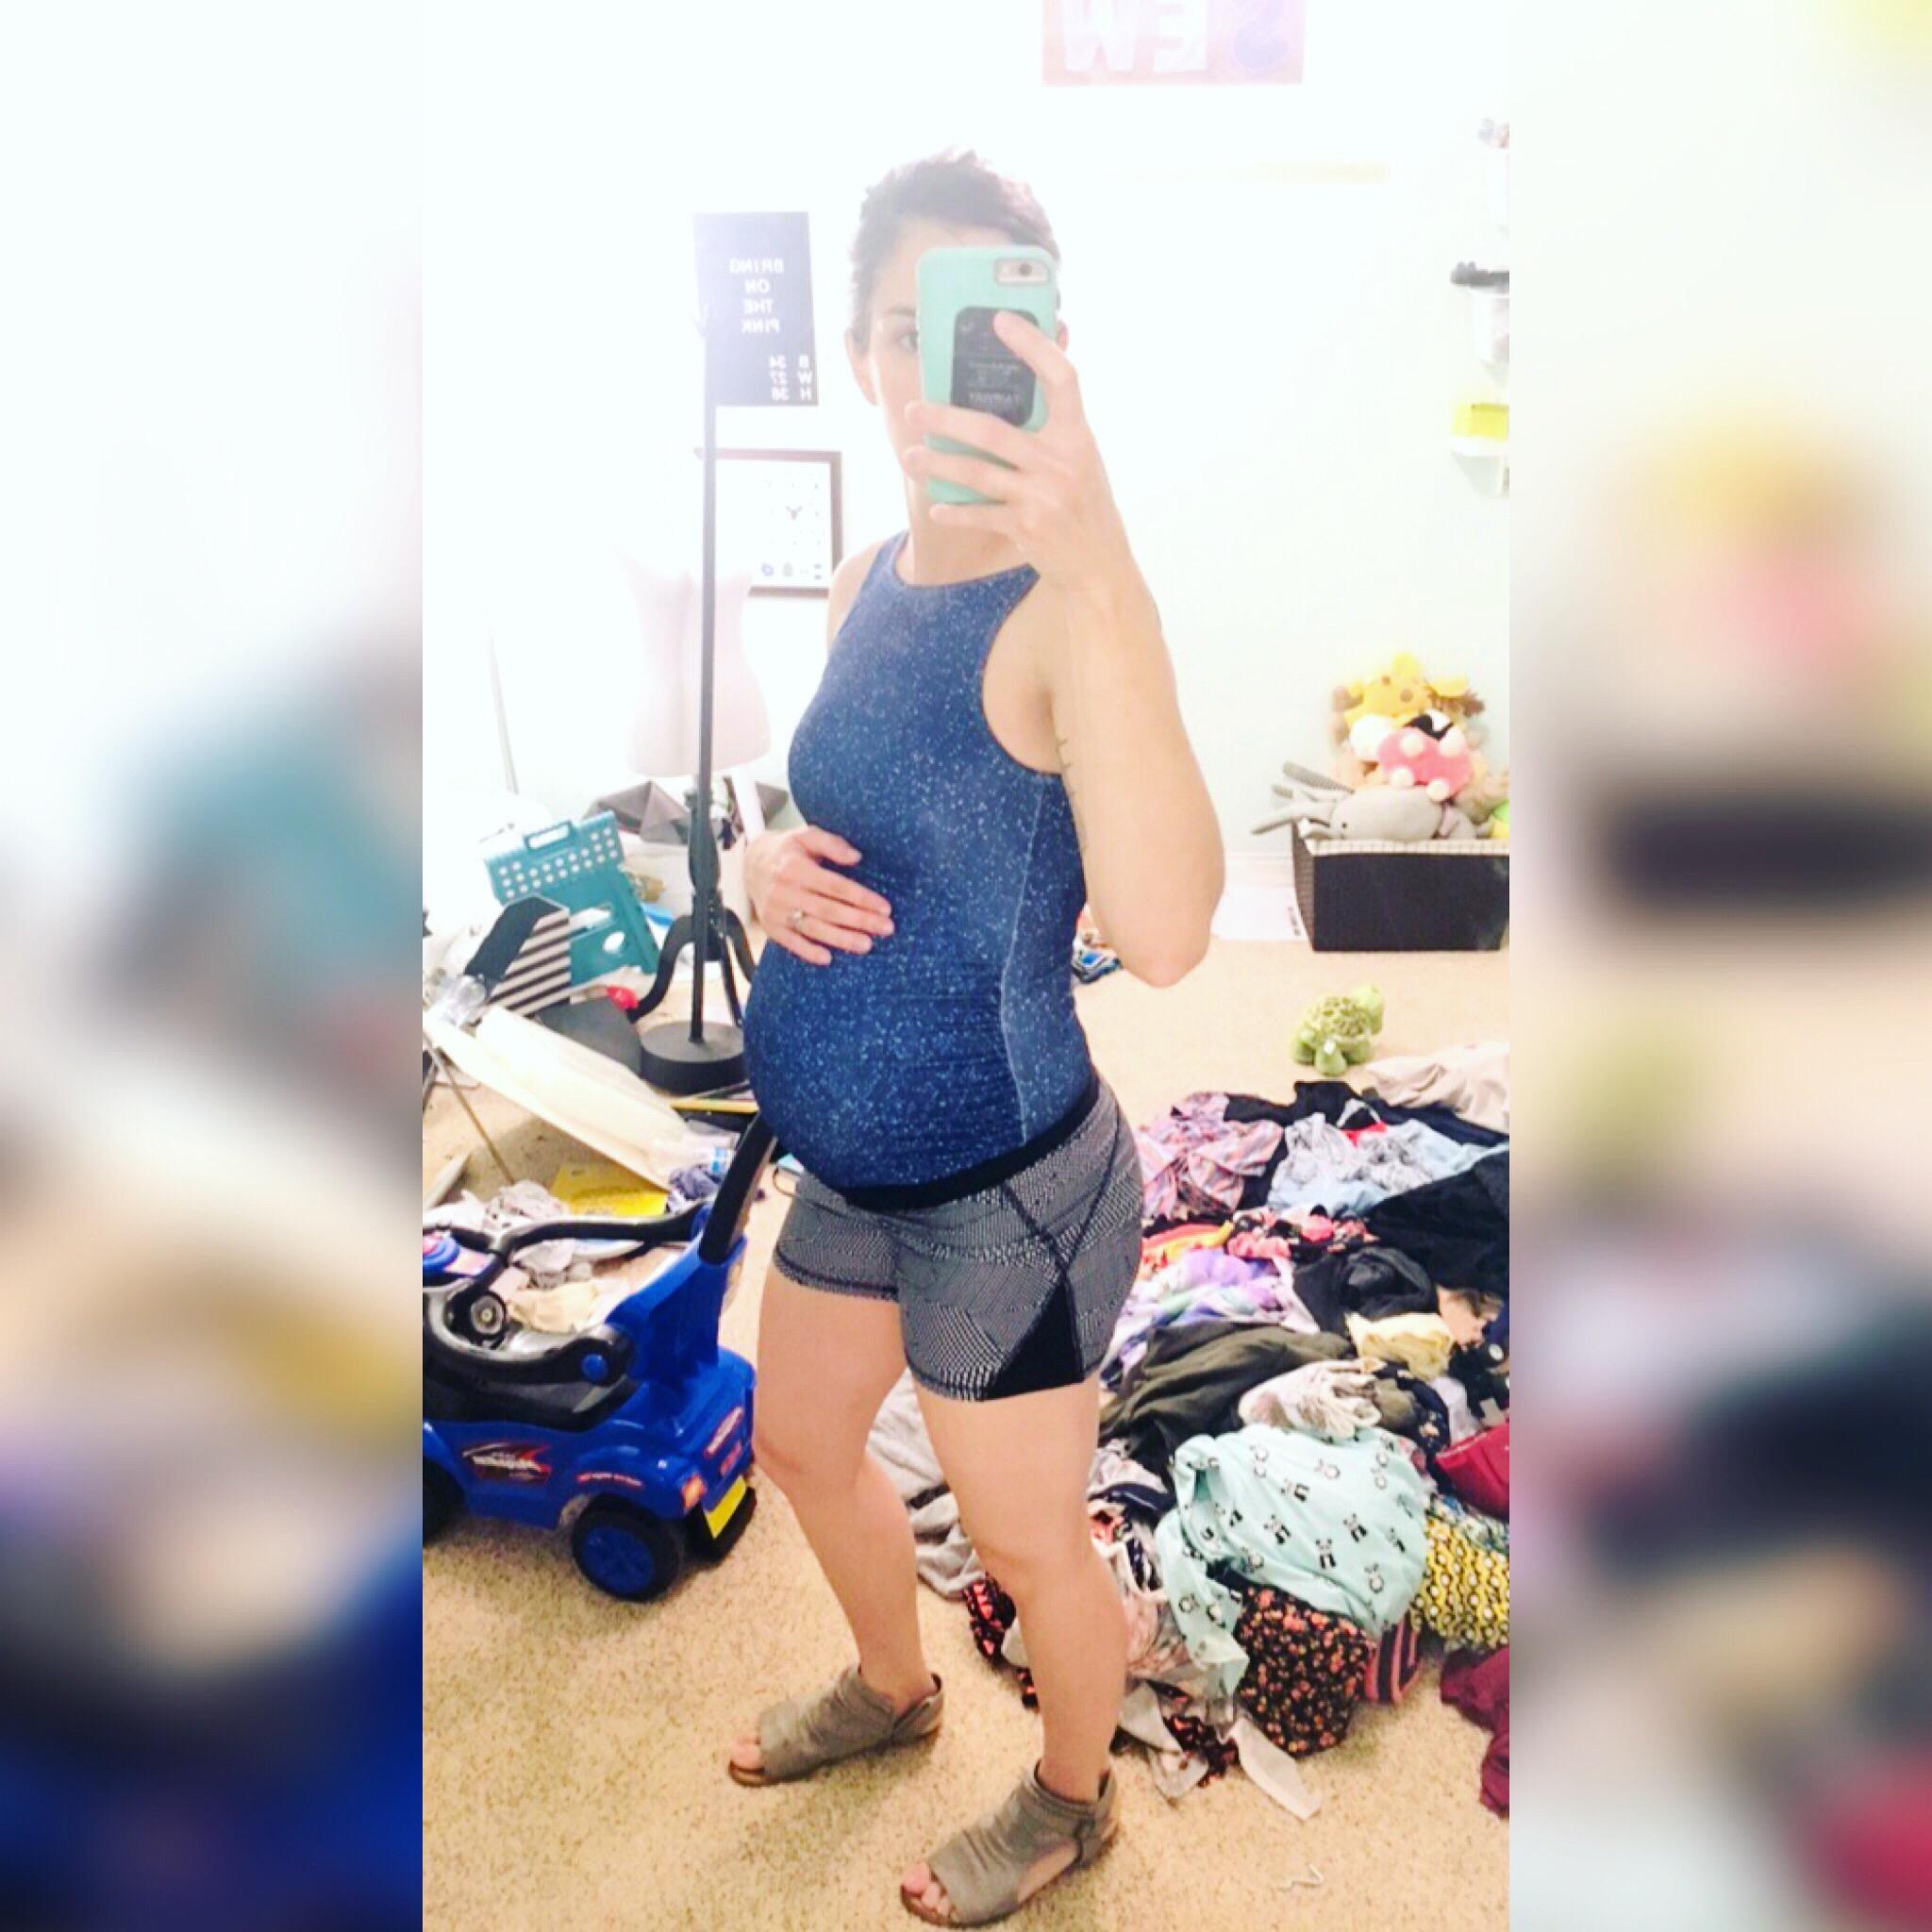 May 15 - Mairin Swimsuit